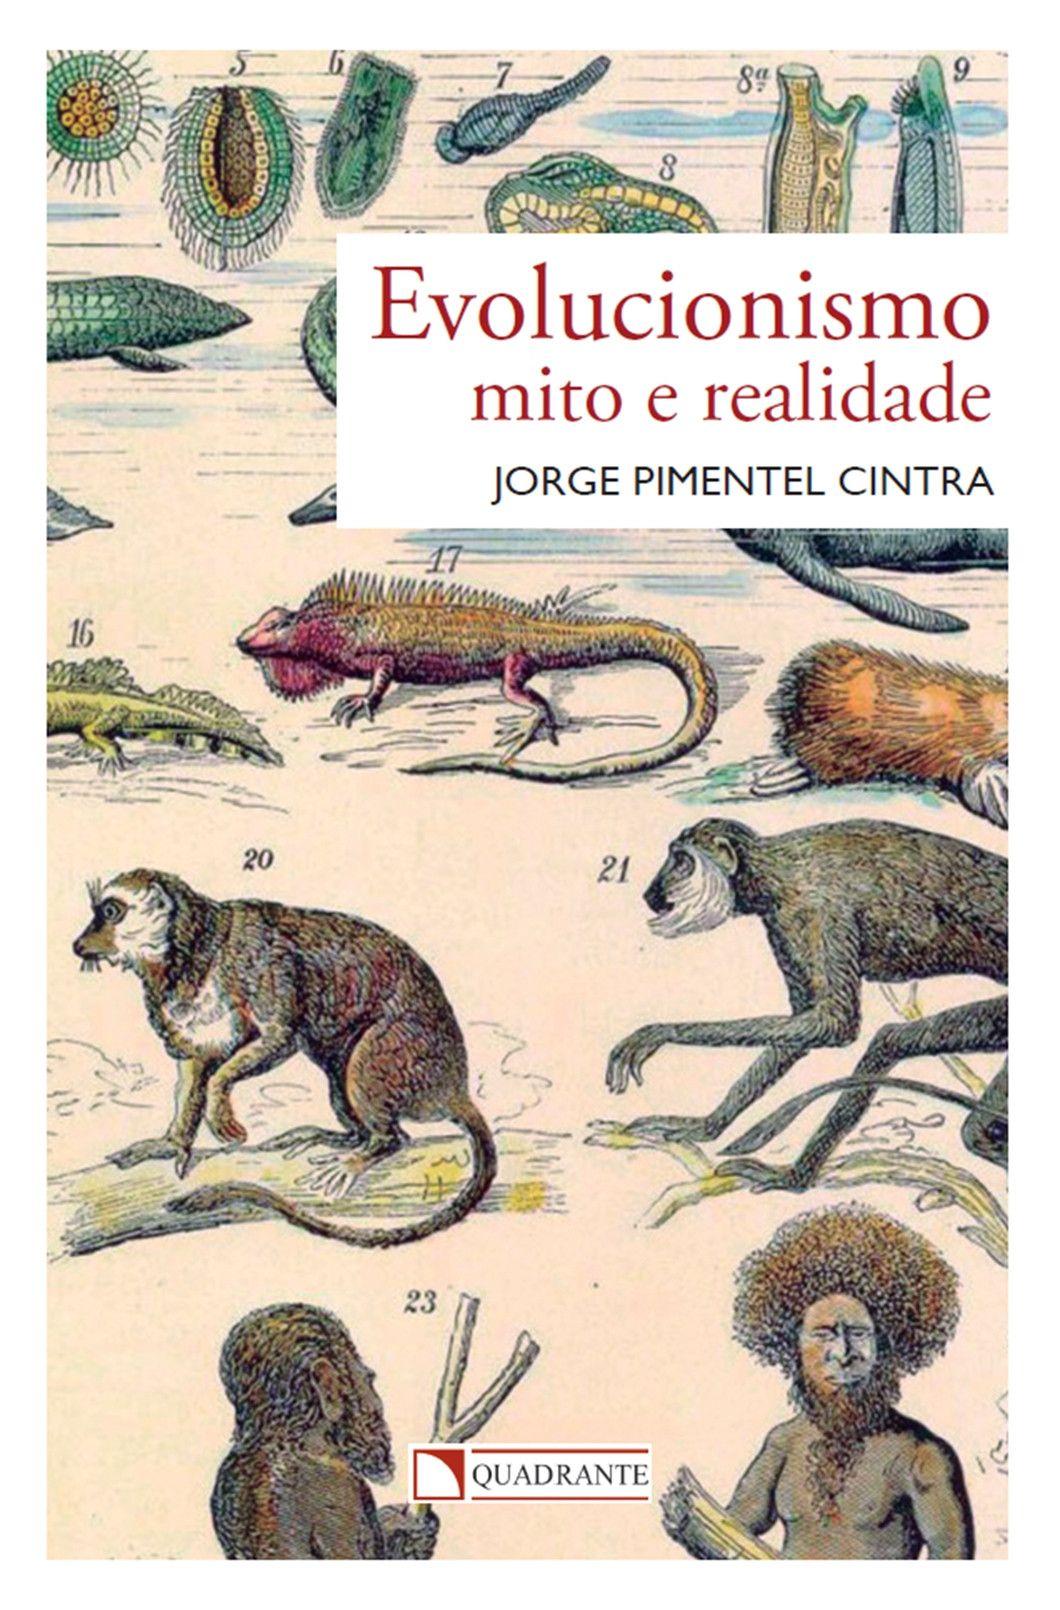 Livro Evolucionismo: mito e realidade